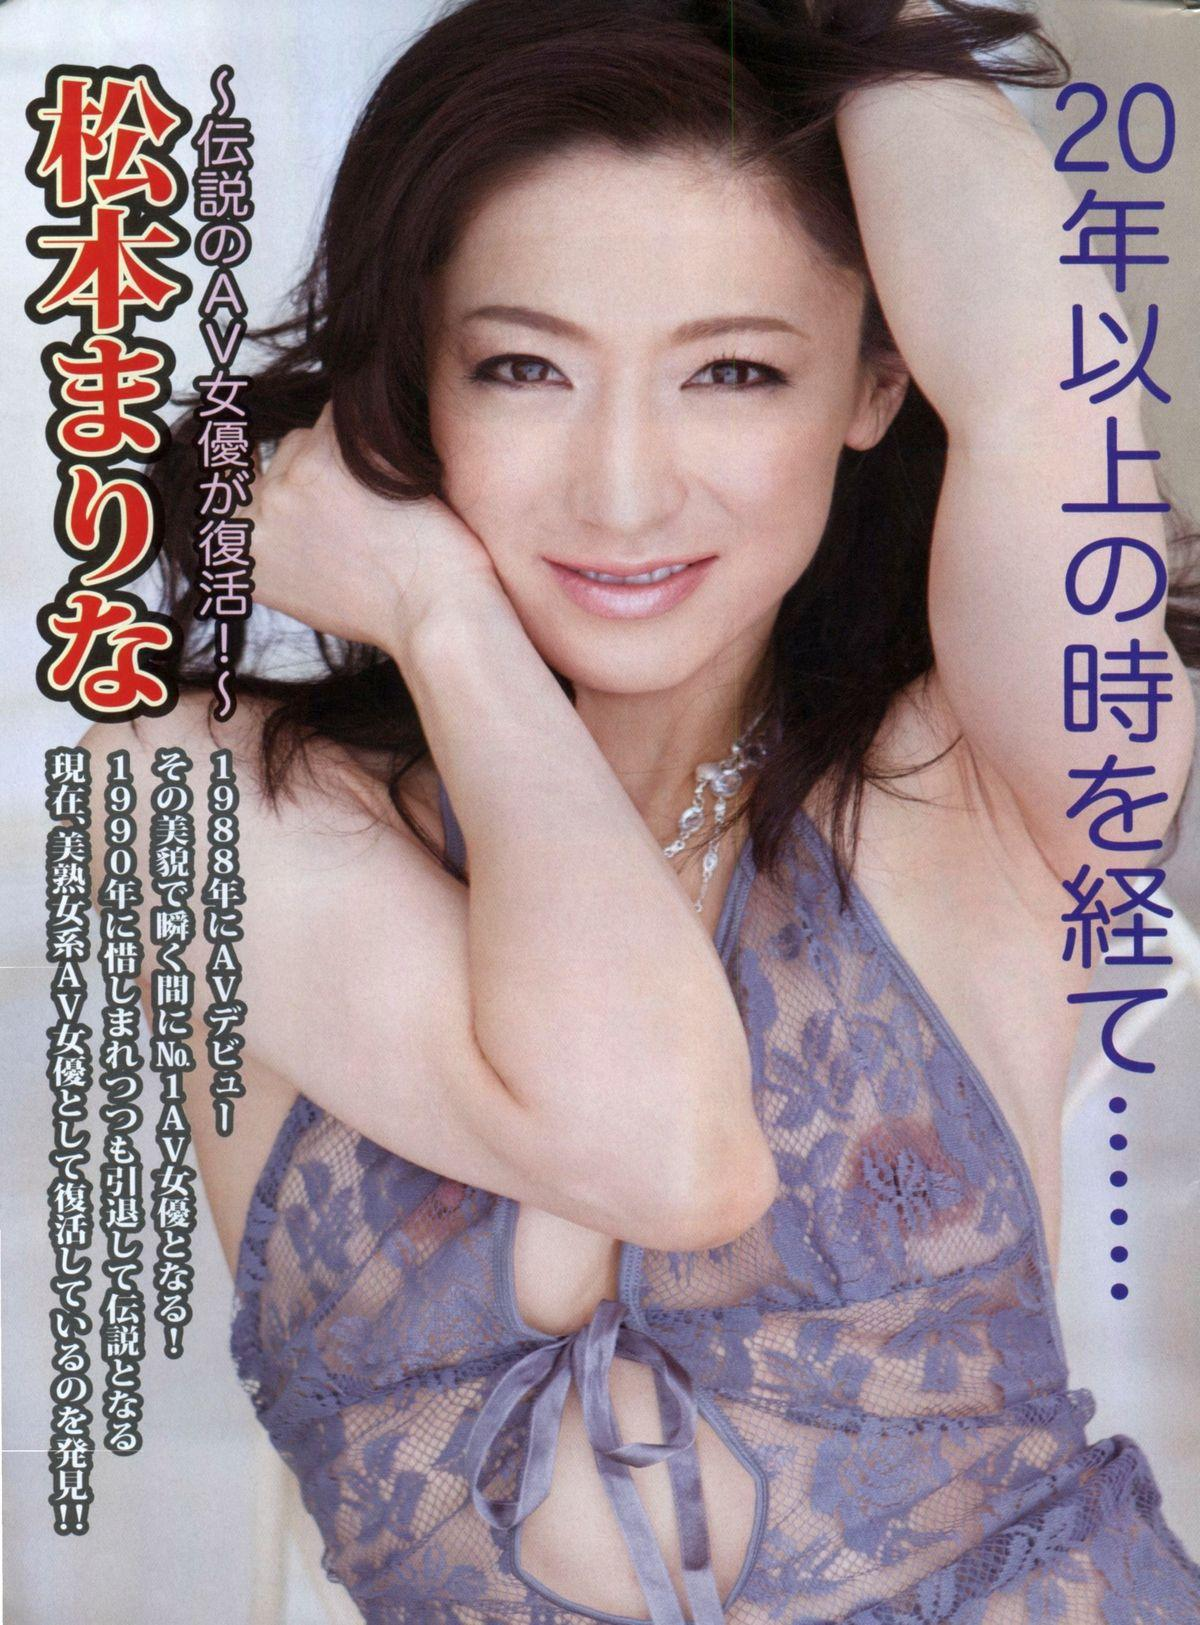 Manga Bon 2013-02 178